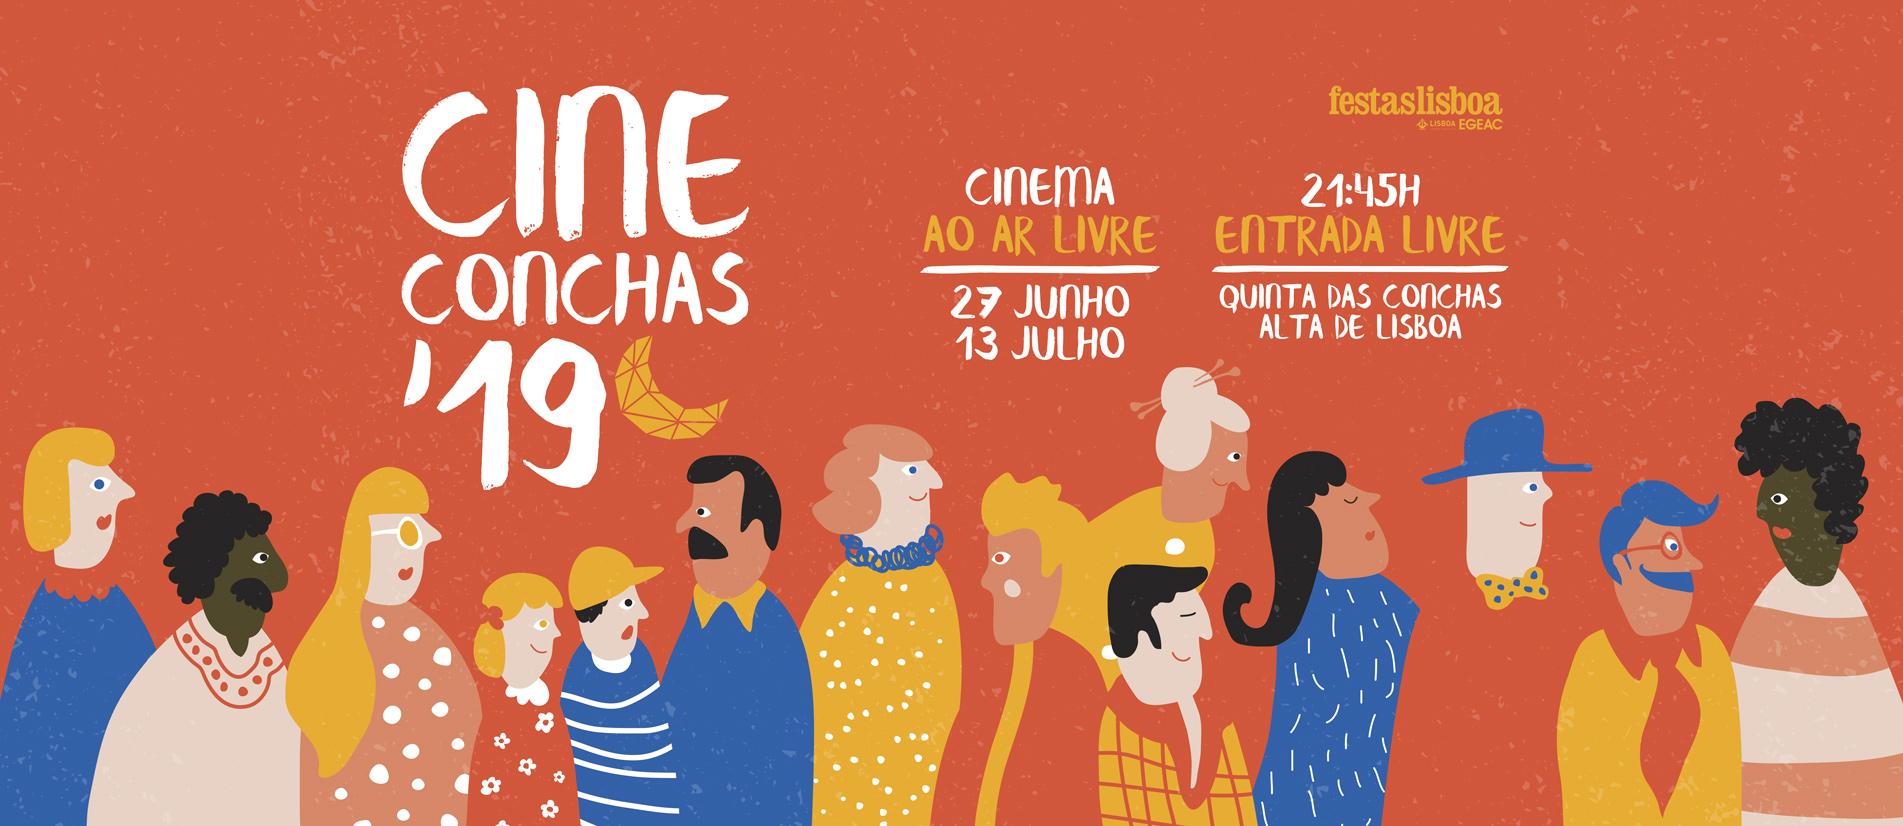 cineconchas 2017 programa